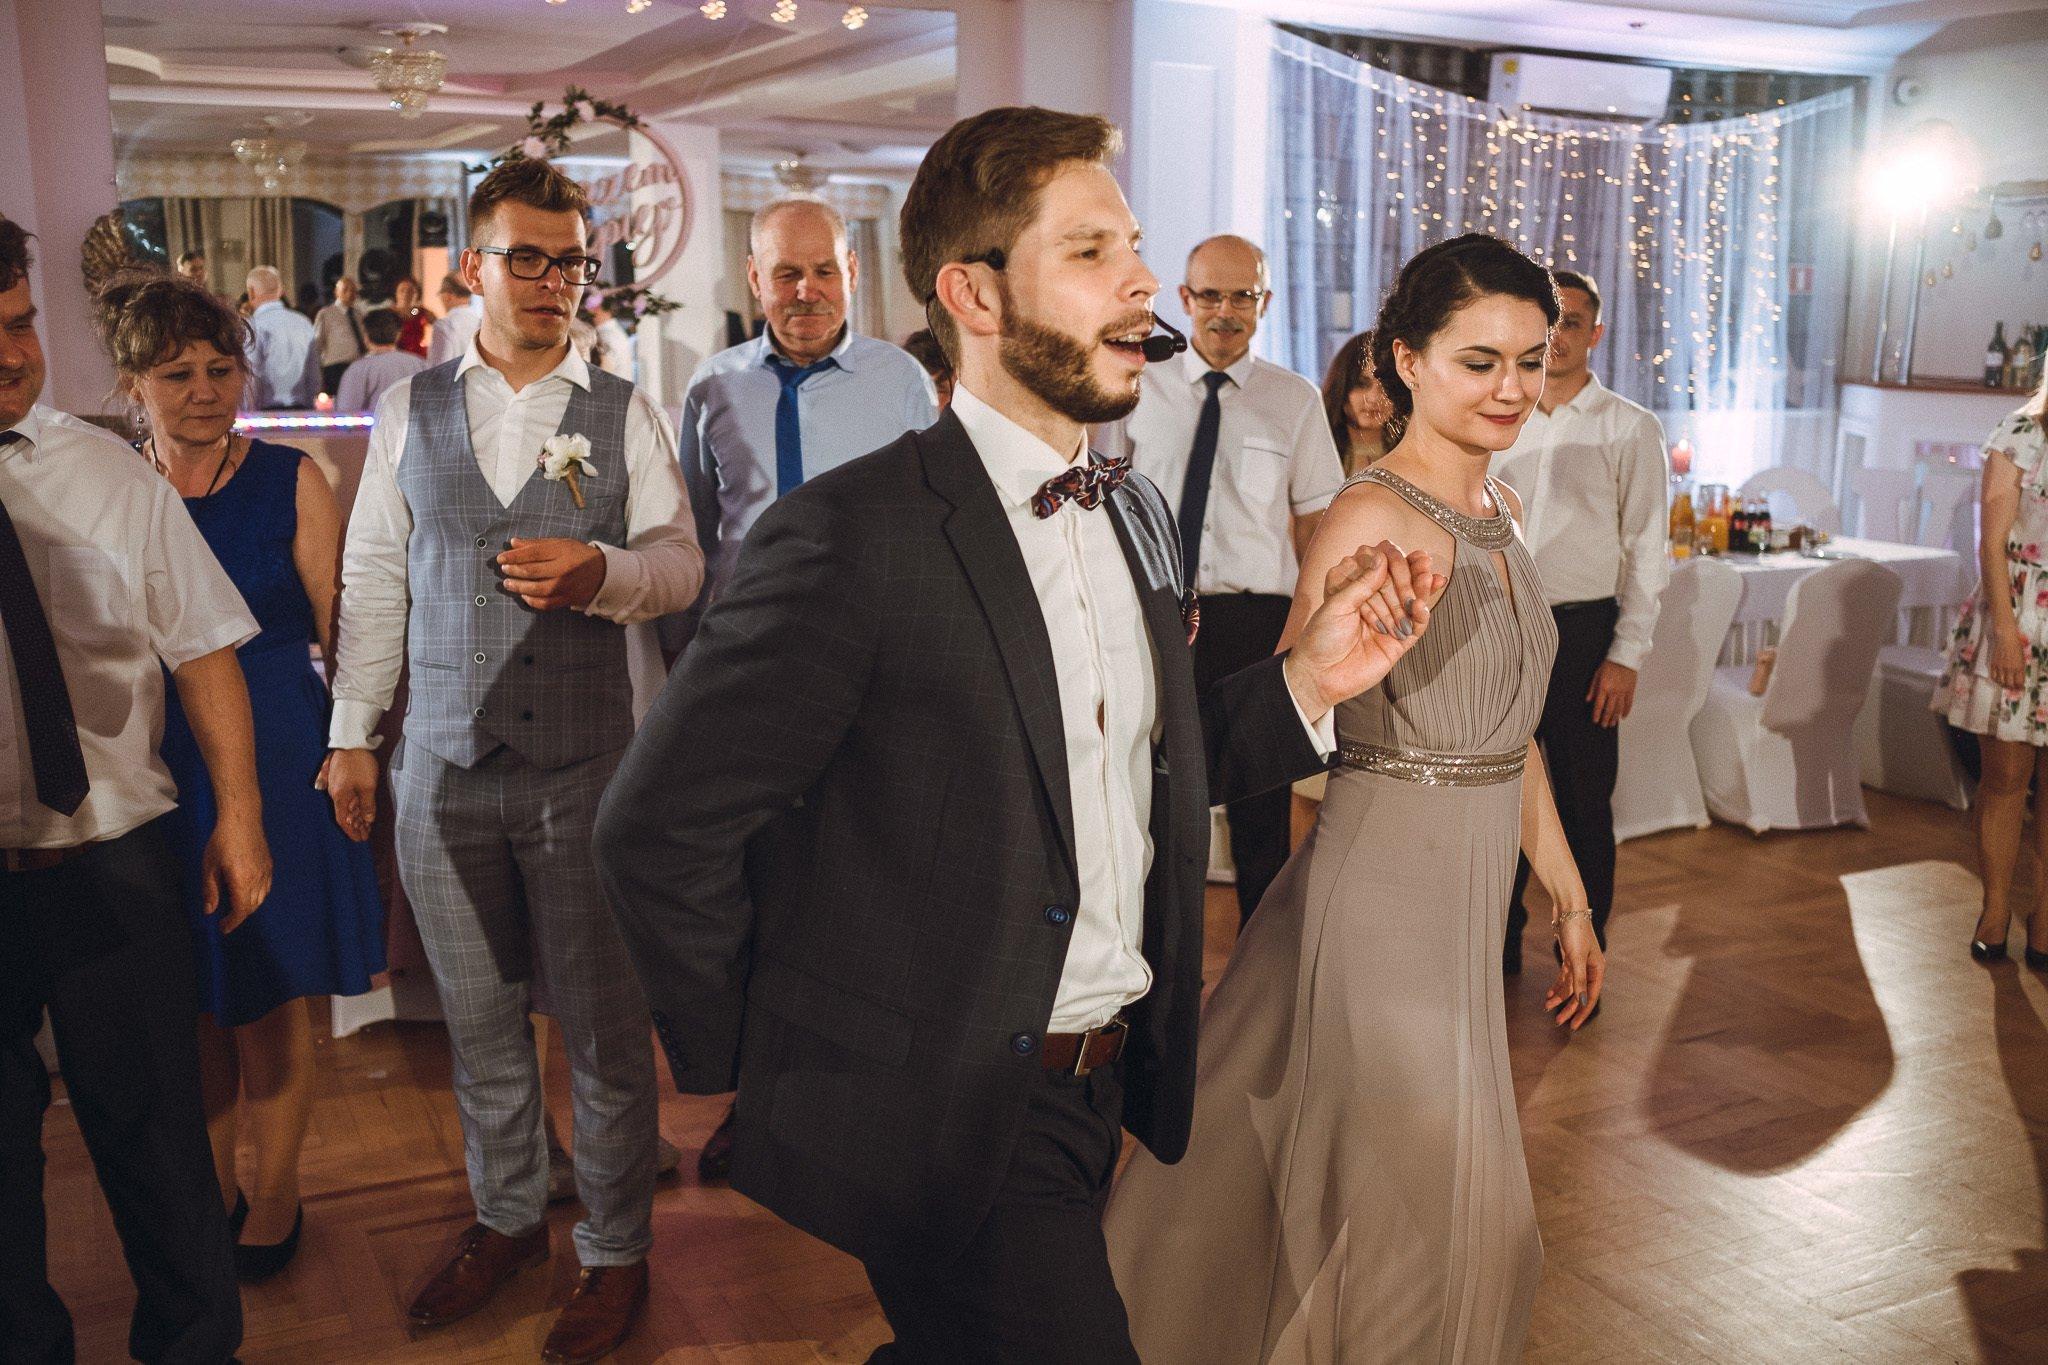 Taniec belgijski